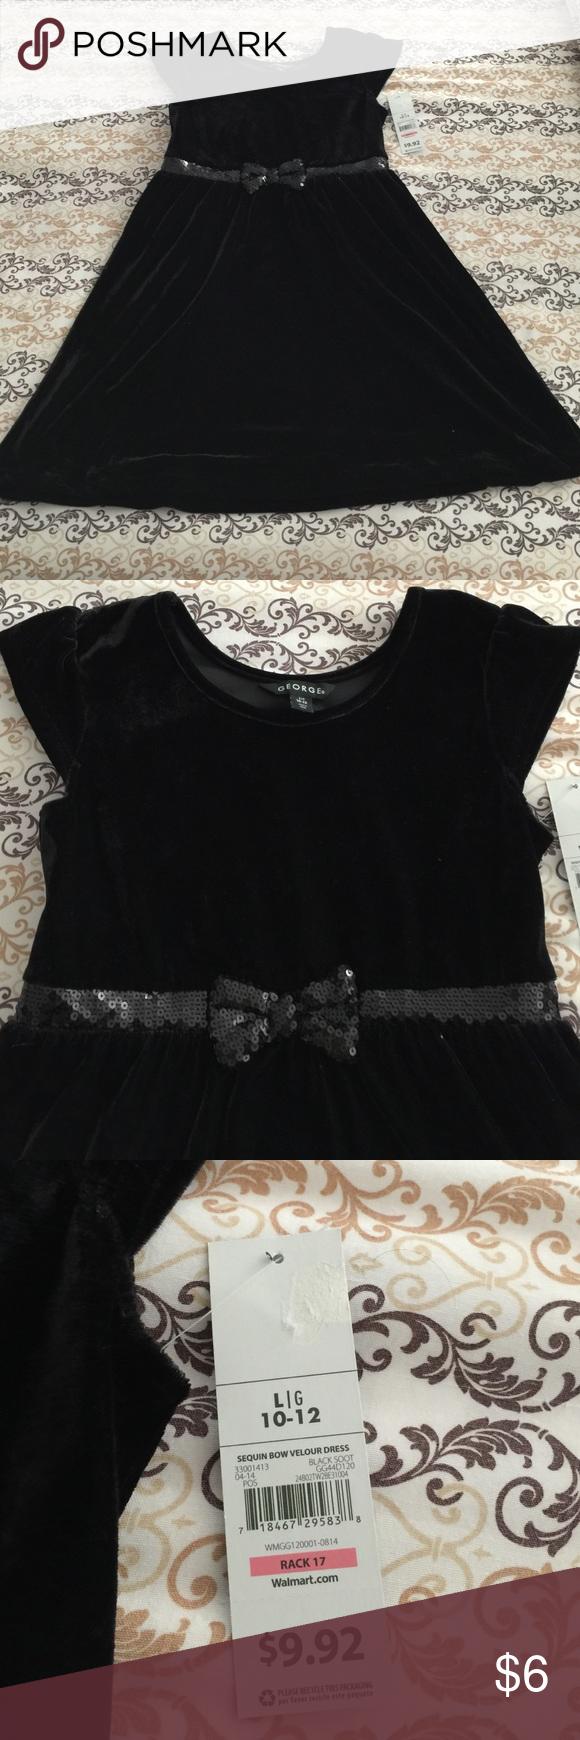 Black Dress For Girl Size 10 12 Size Girls Girls Dresses Black Dress [ 1740 x 580 Pixel ]